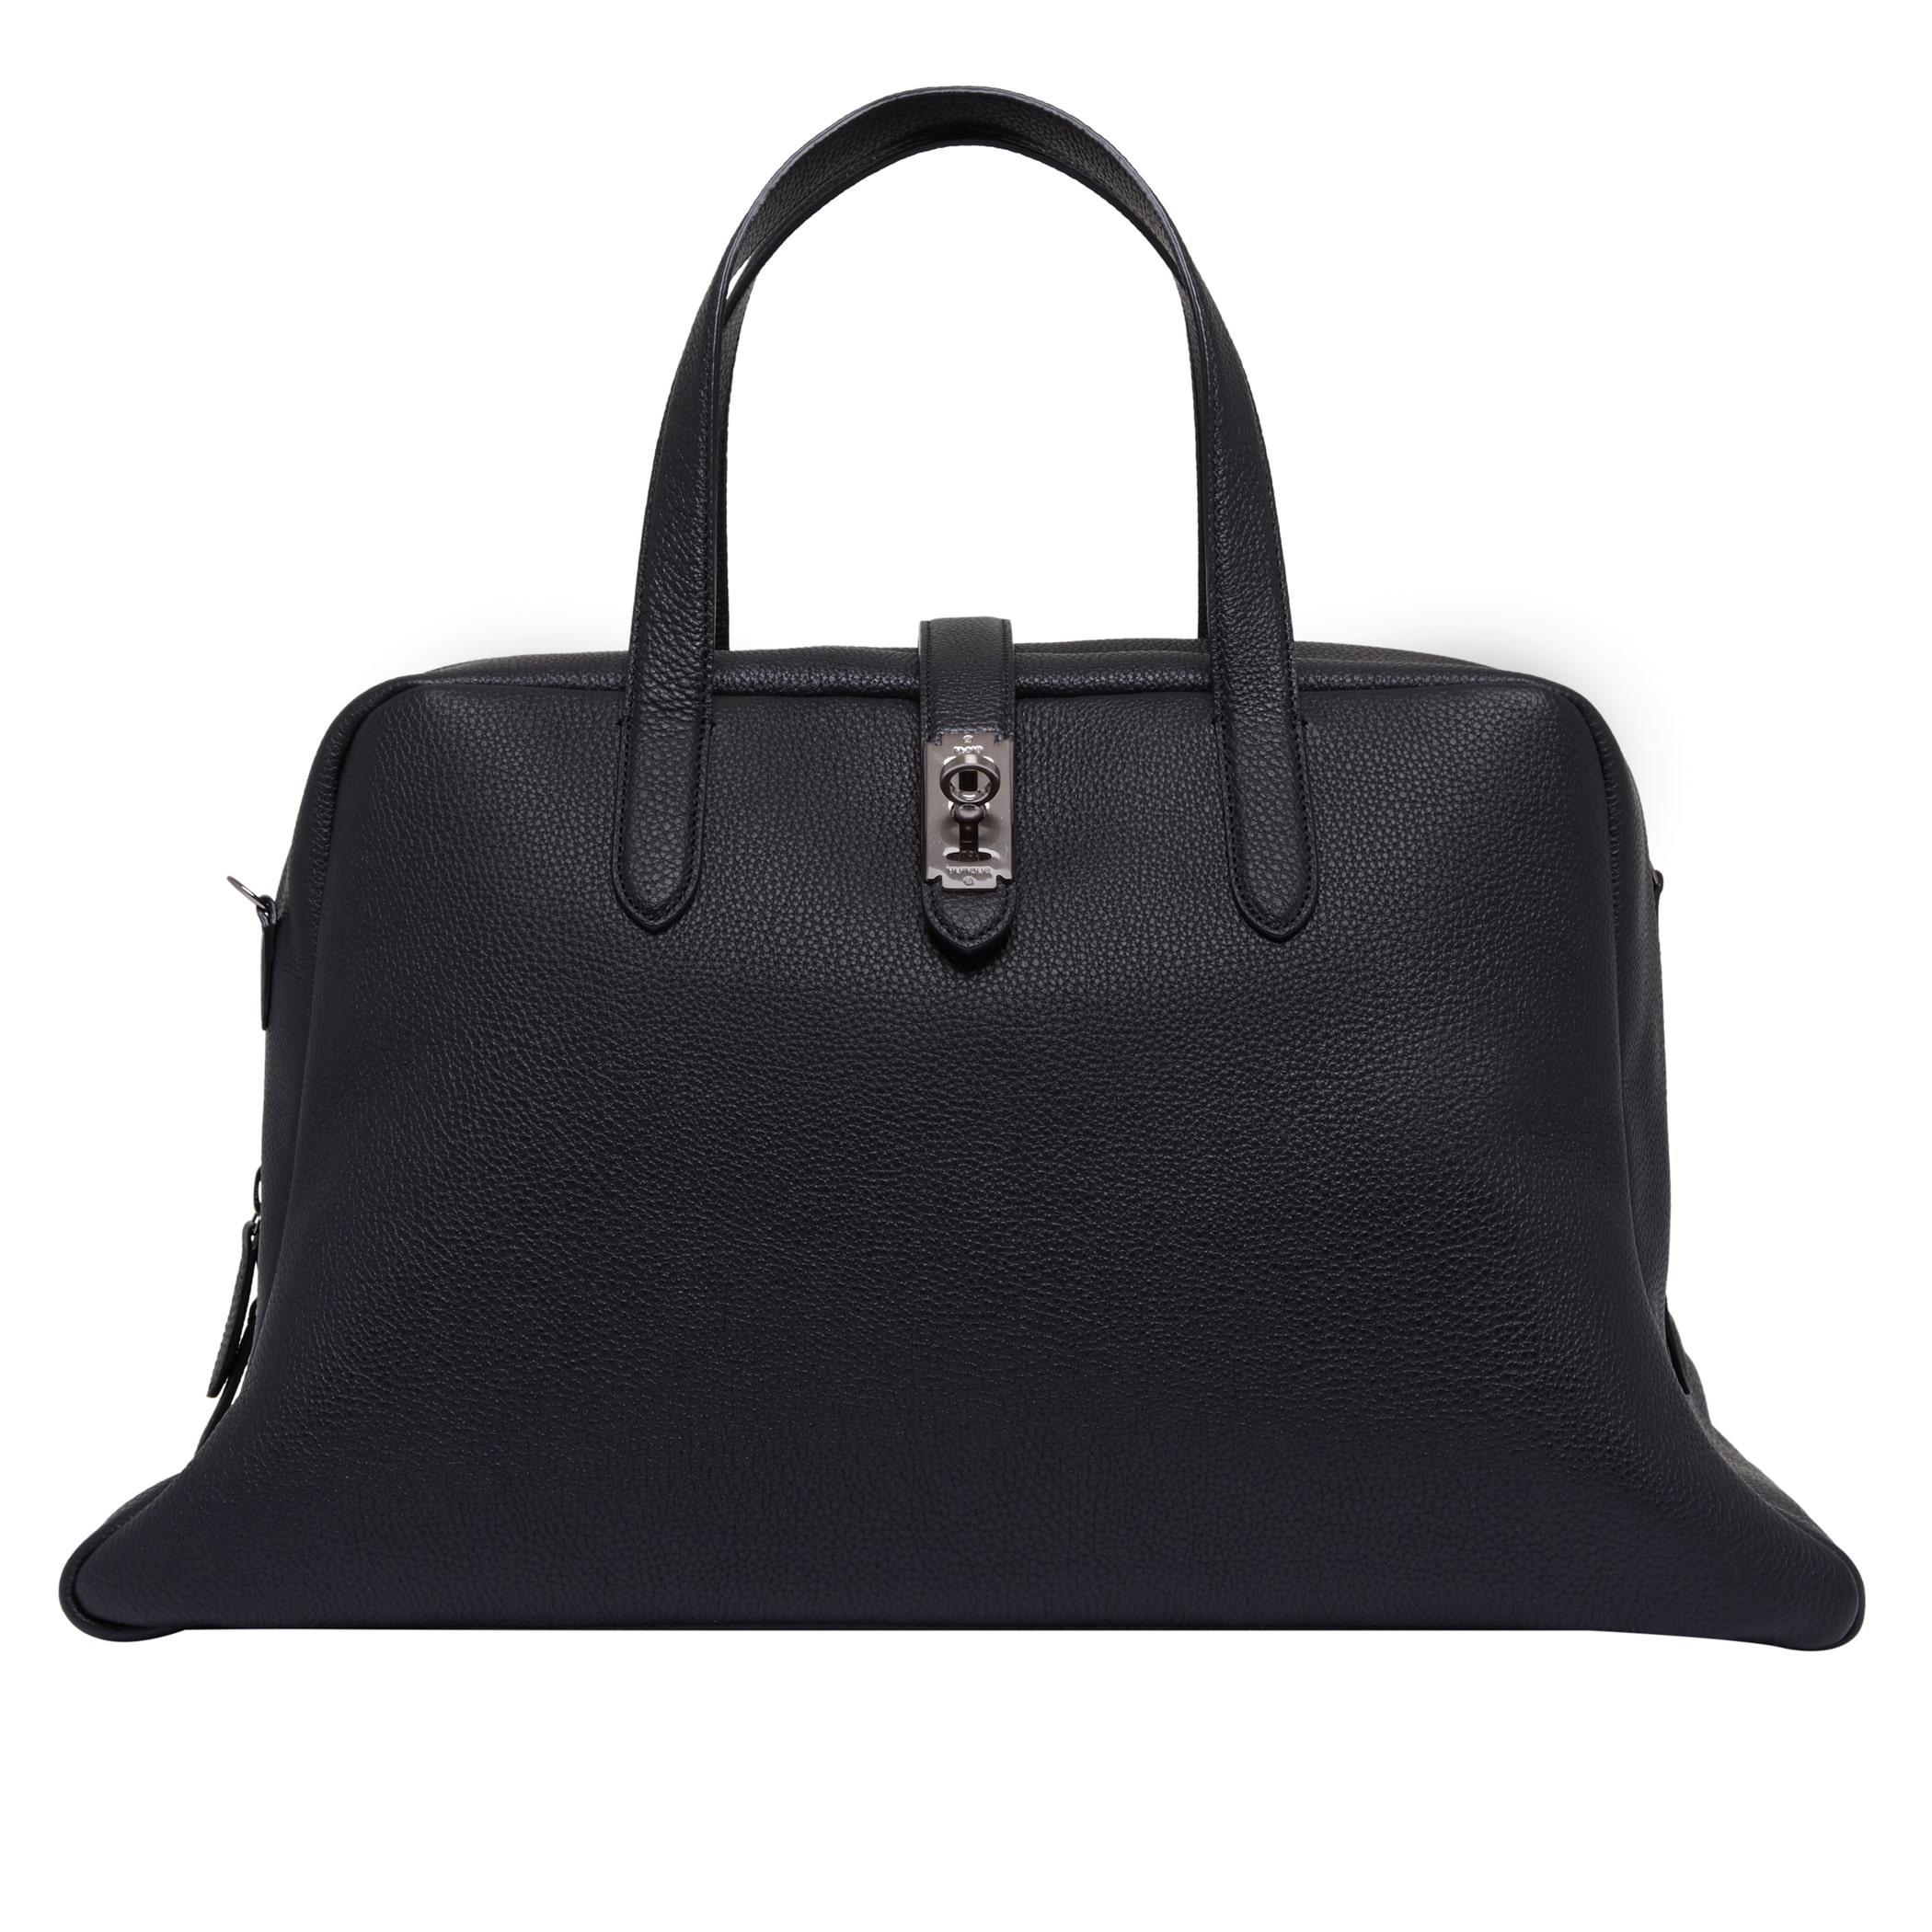 Toque tote Weekend Bag (토크 토트 위켄드 백) Black